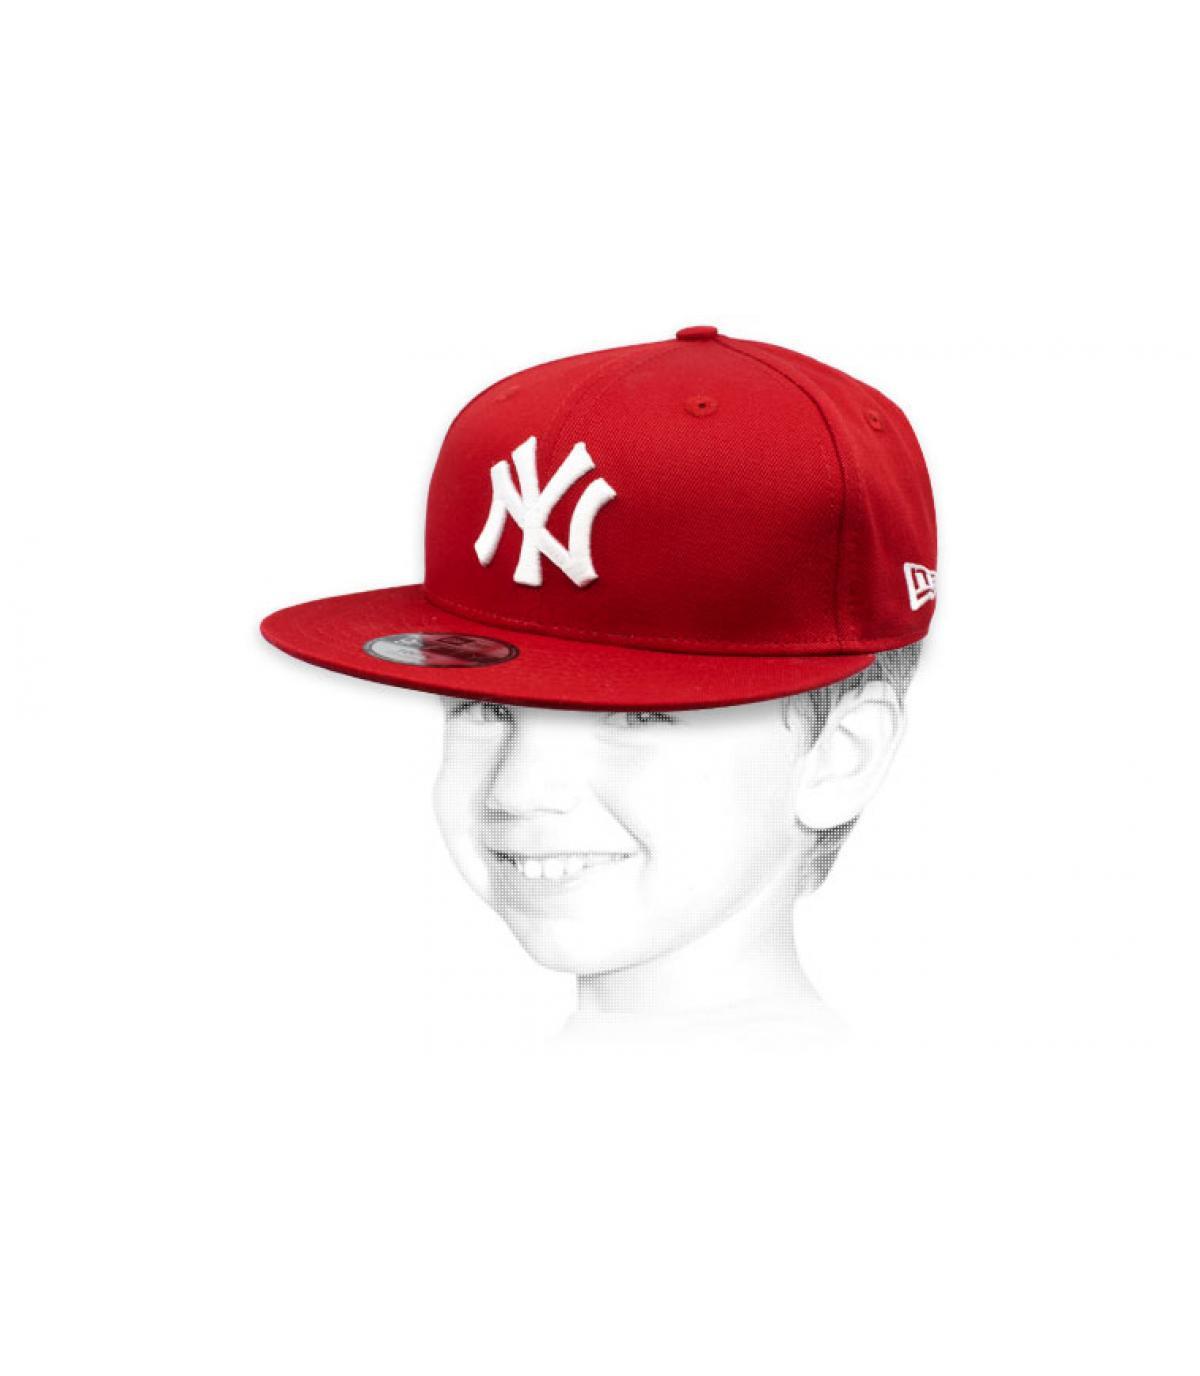 kindermuts NY rood wit